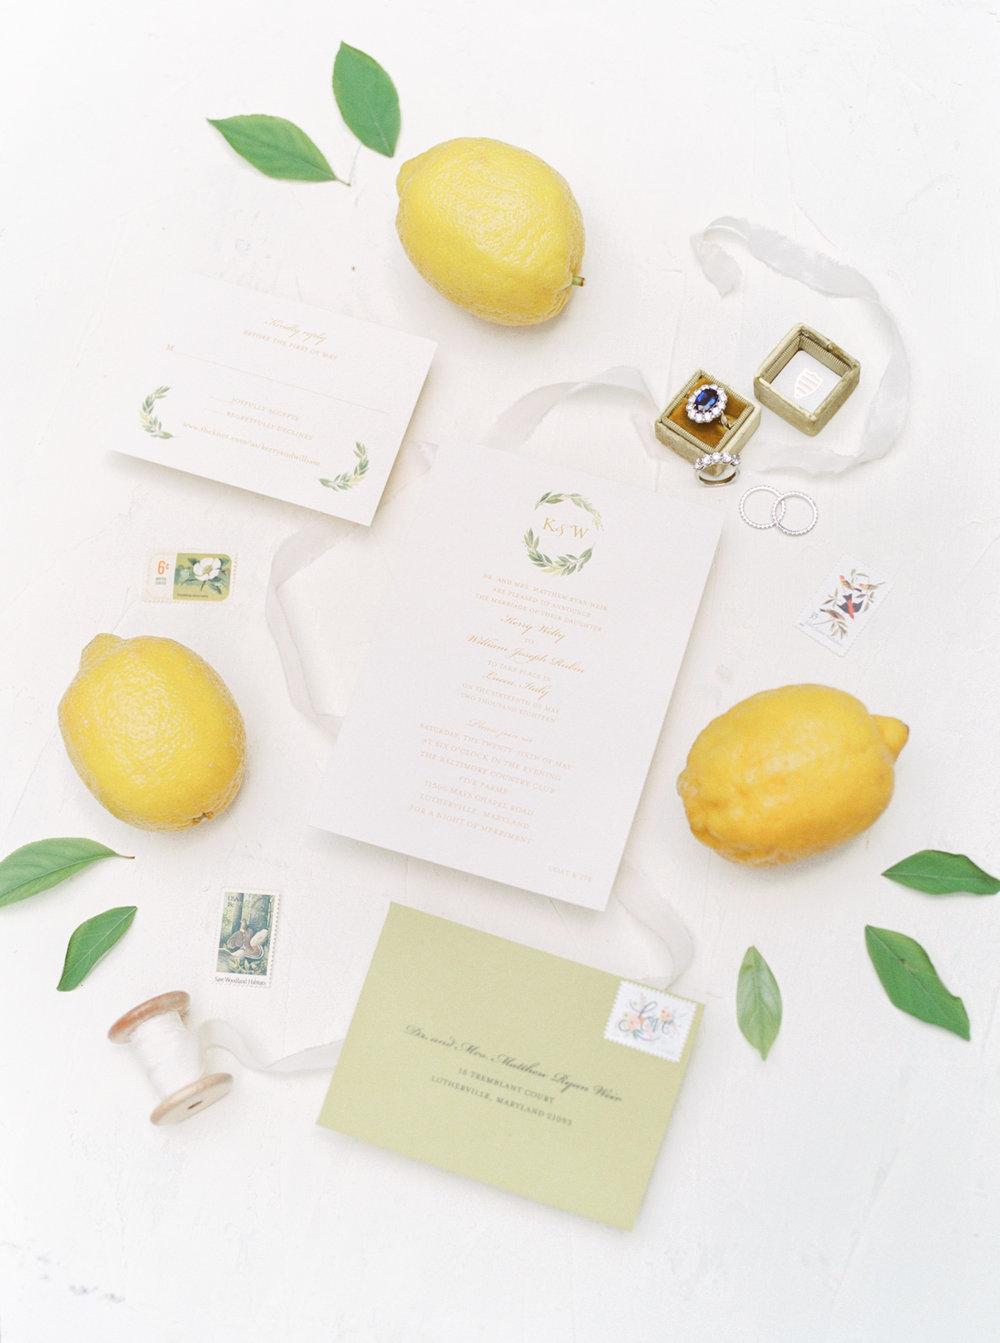 haley-richter-photography-keristin-gaber-associate-baltimore-country-club-spring-wedding-italian-lemon-inspired-119.jpg